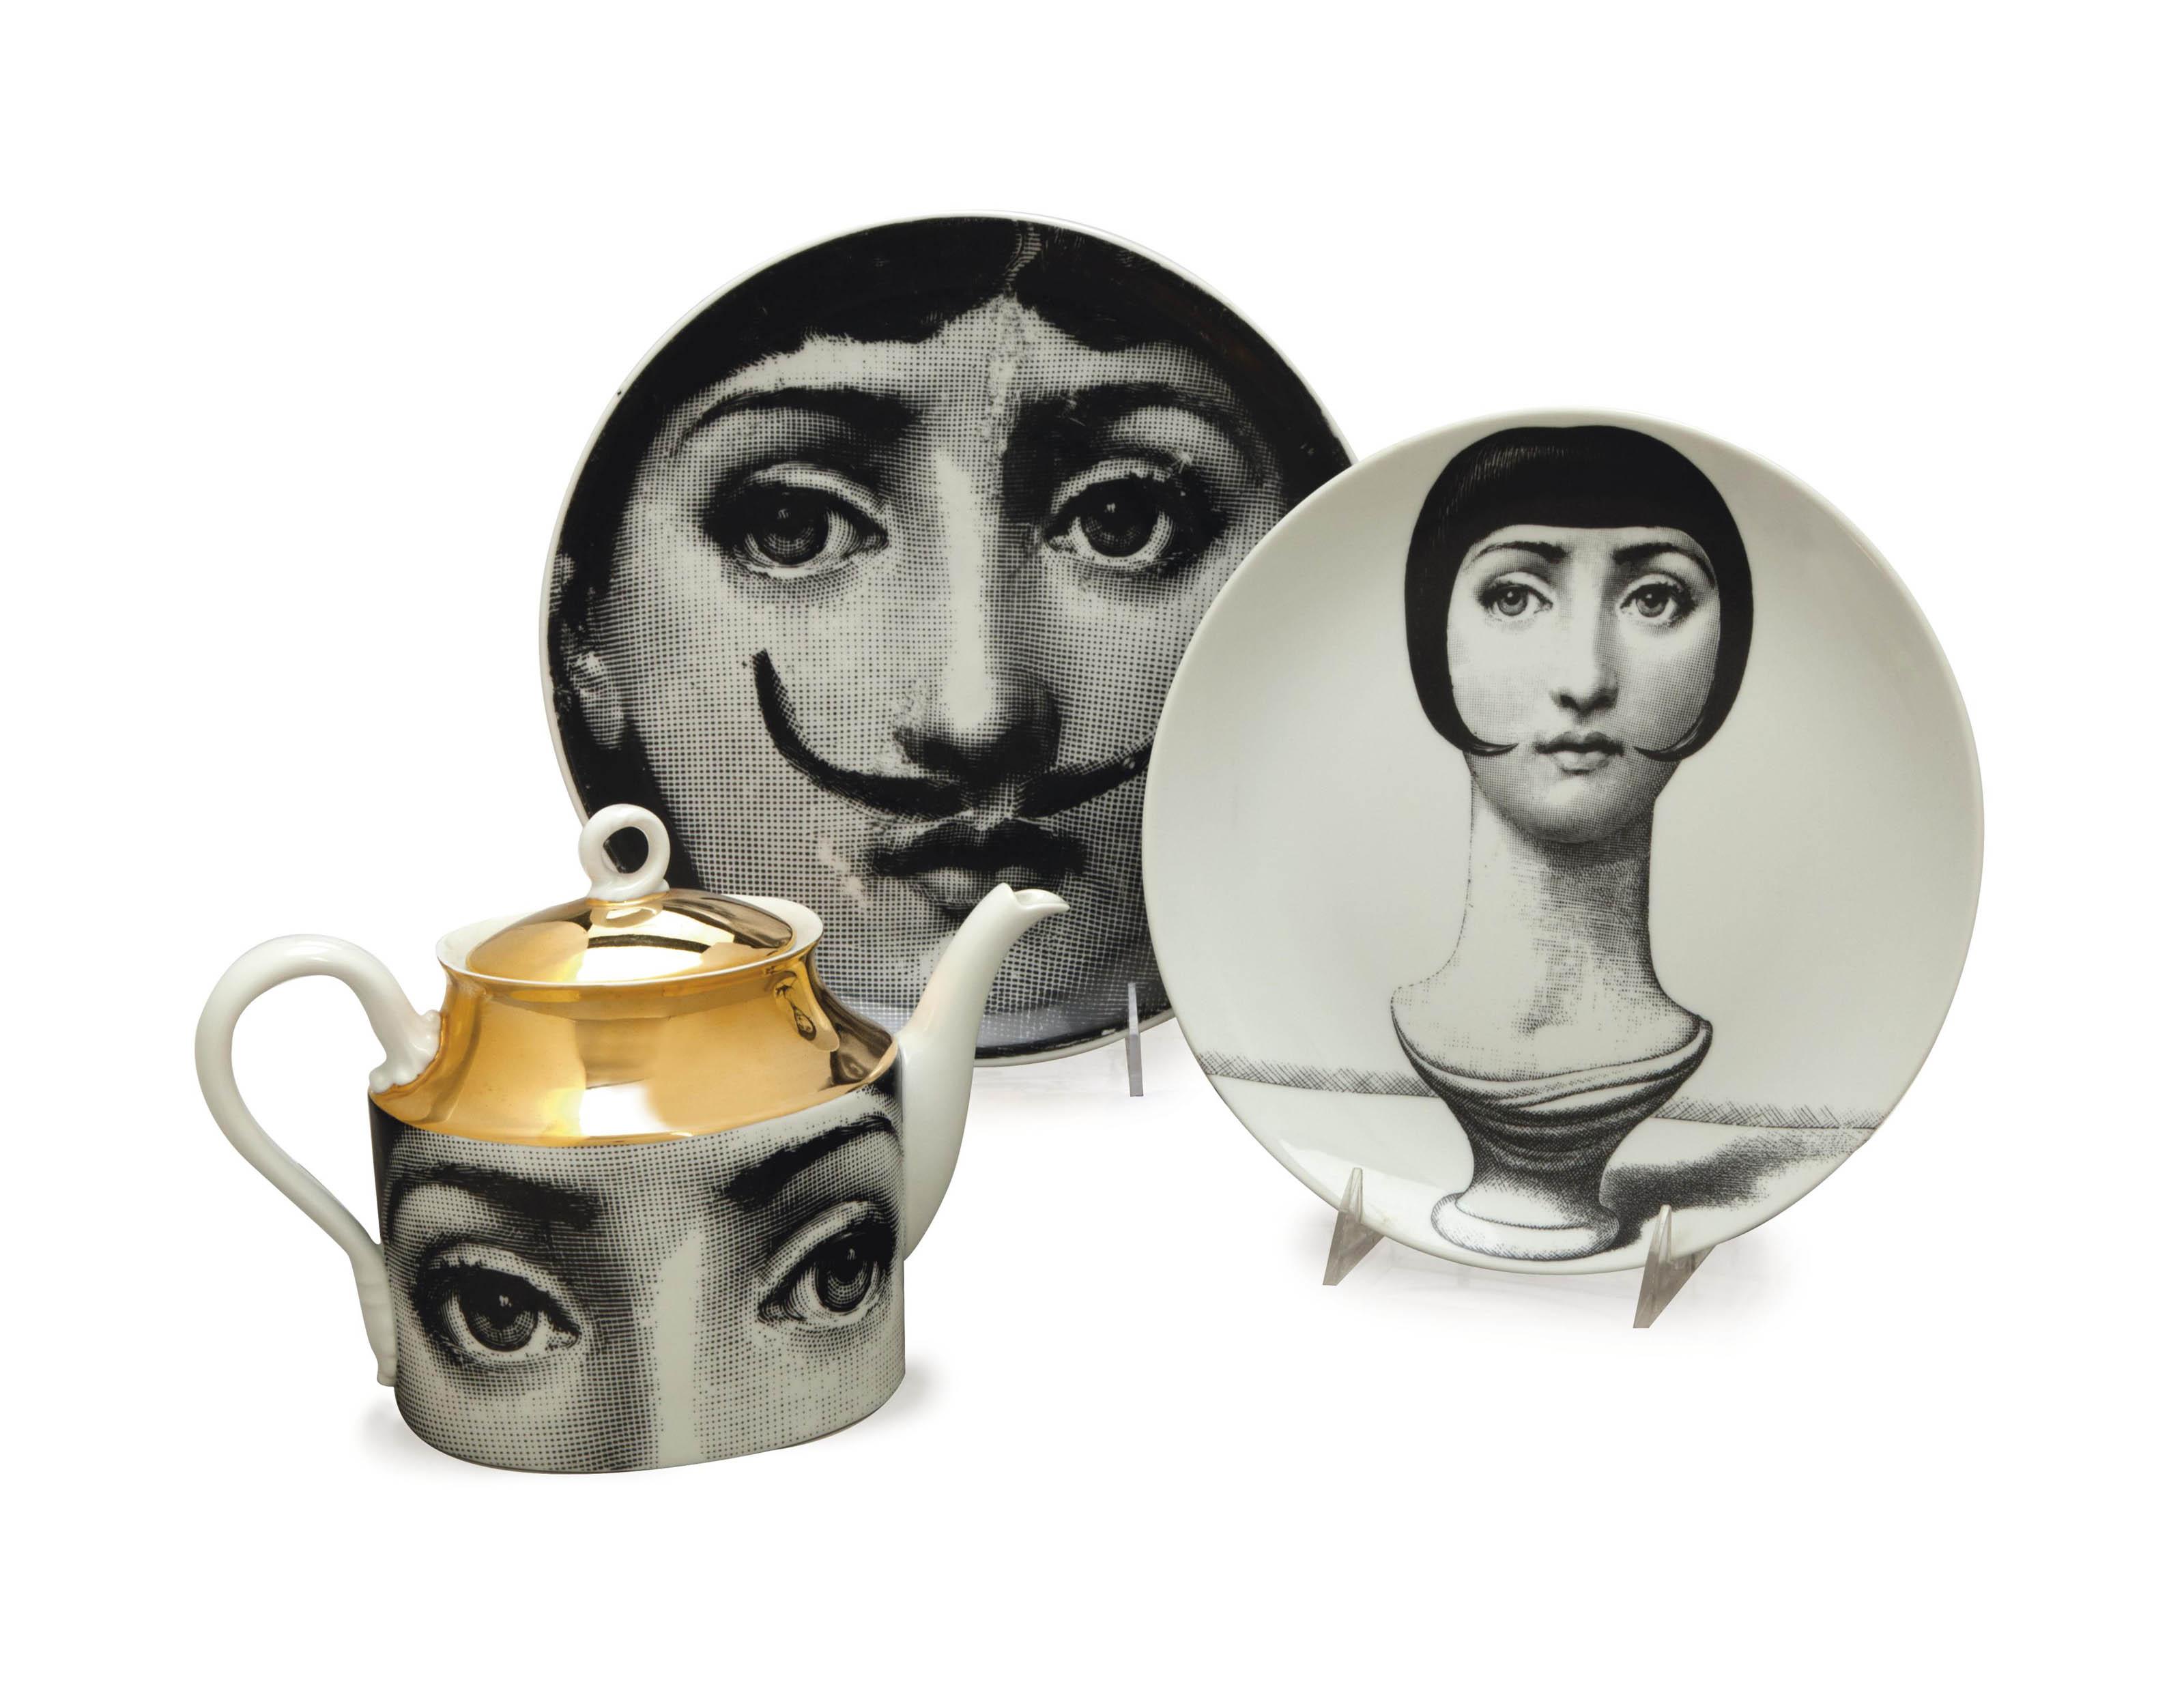 AN ASSEMBLED ITALIAN PORCELAIN FORNASETTI DESIGNED 'JULIA' PART TABLE SERVICE,